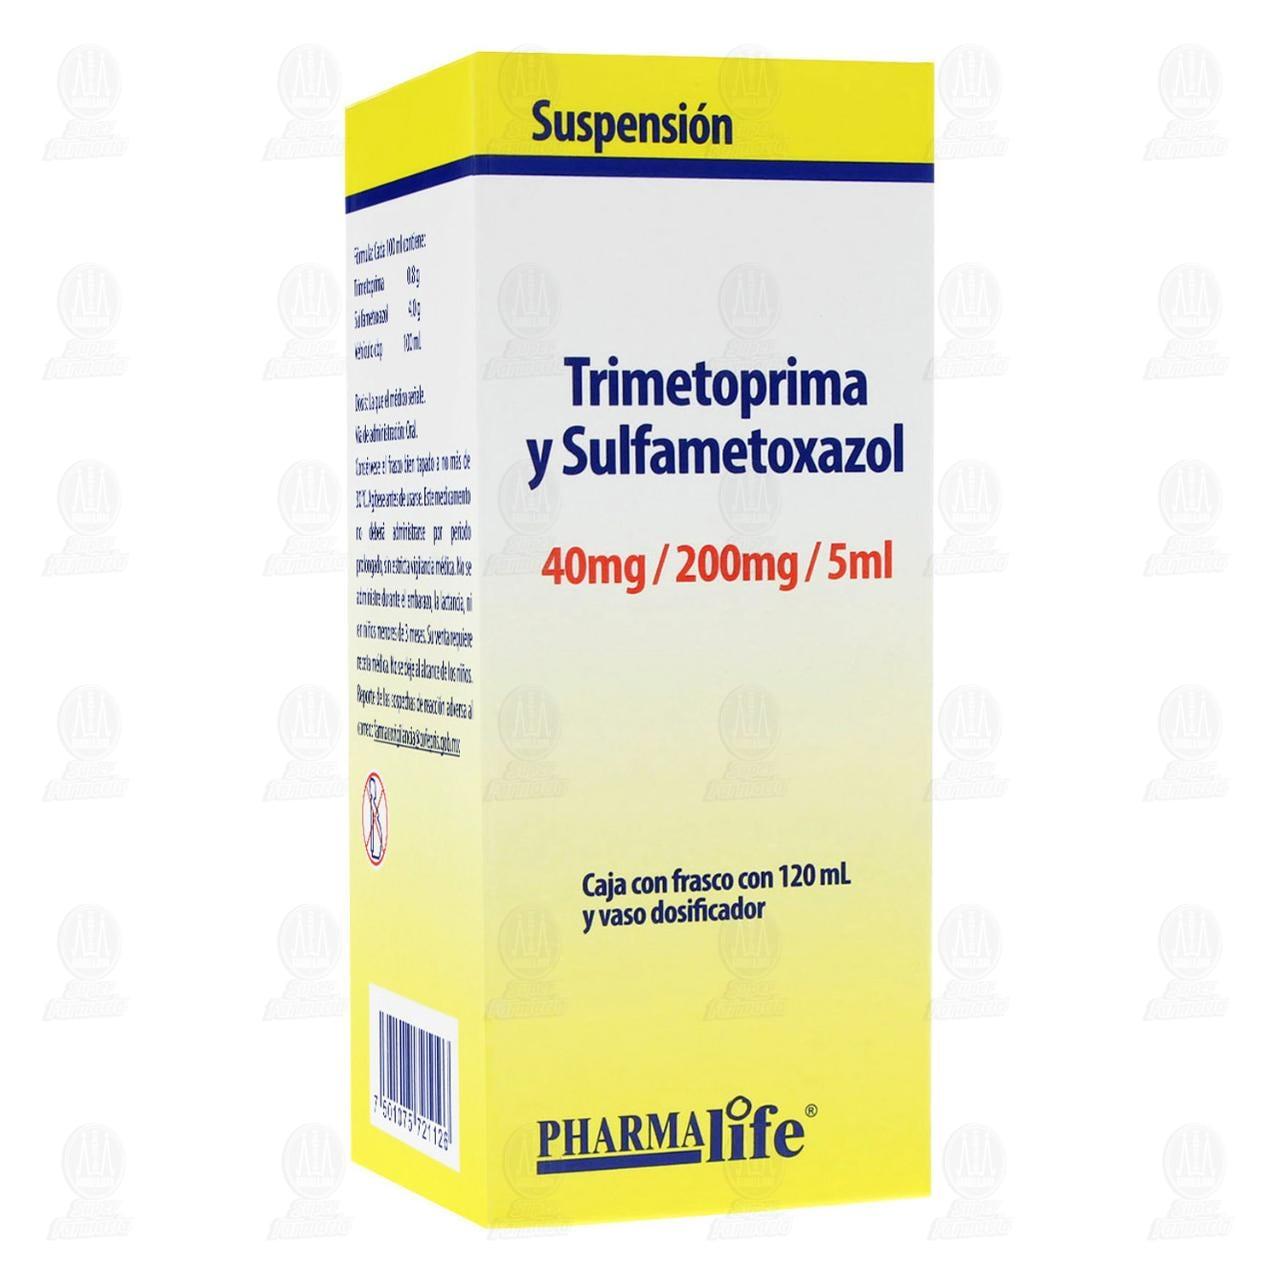 Comprar Trimetoprima / Sulfametoxazol 120ml Suspensión Pharmalife en Farmacias Guadalajara